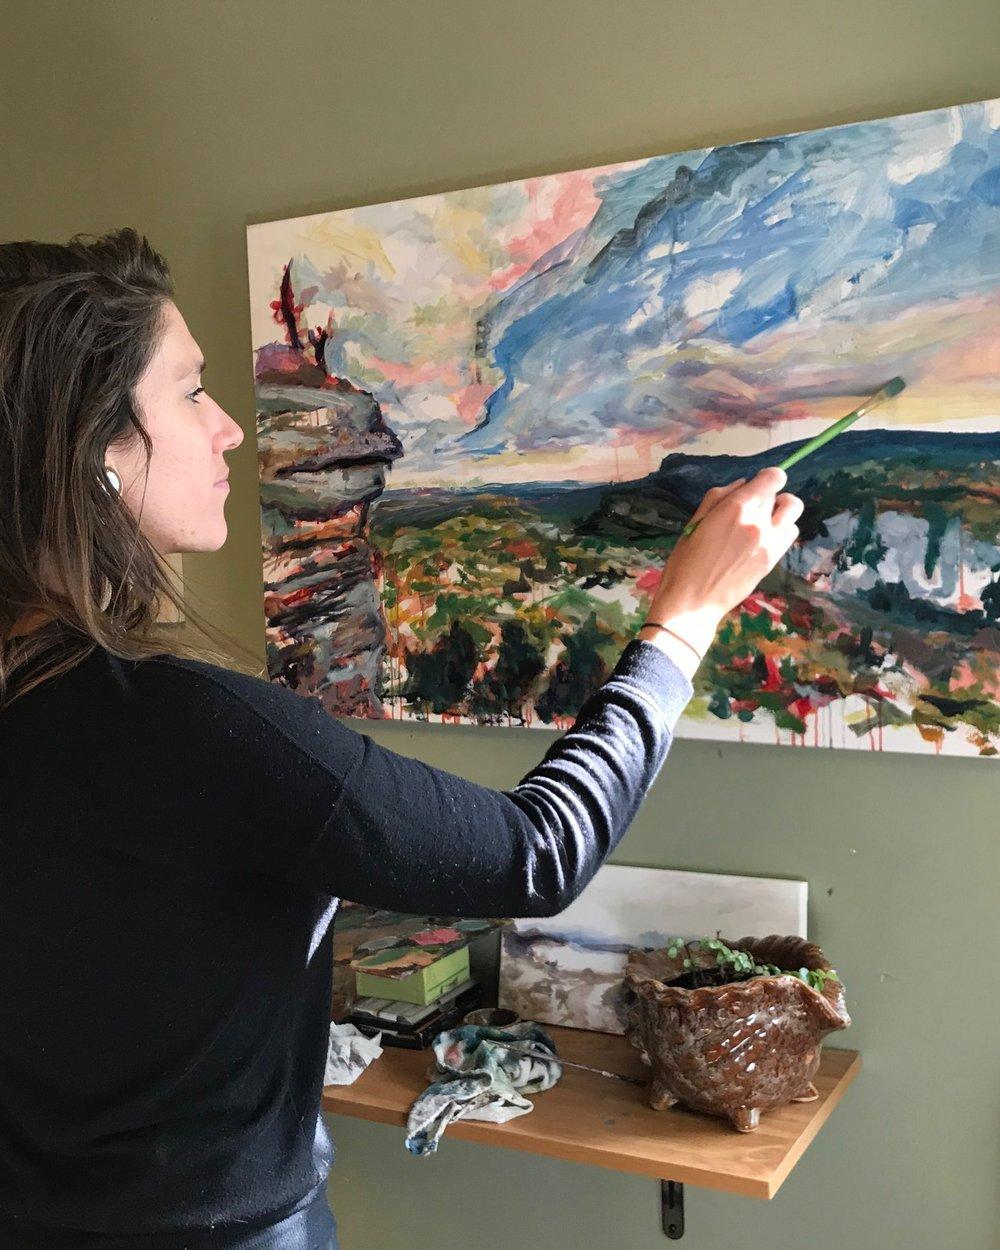 Jane-galletti-art-painting.jpg